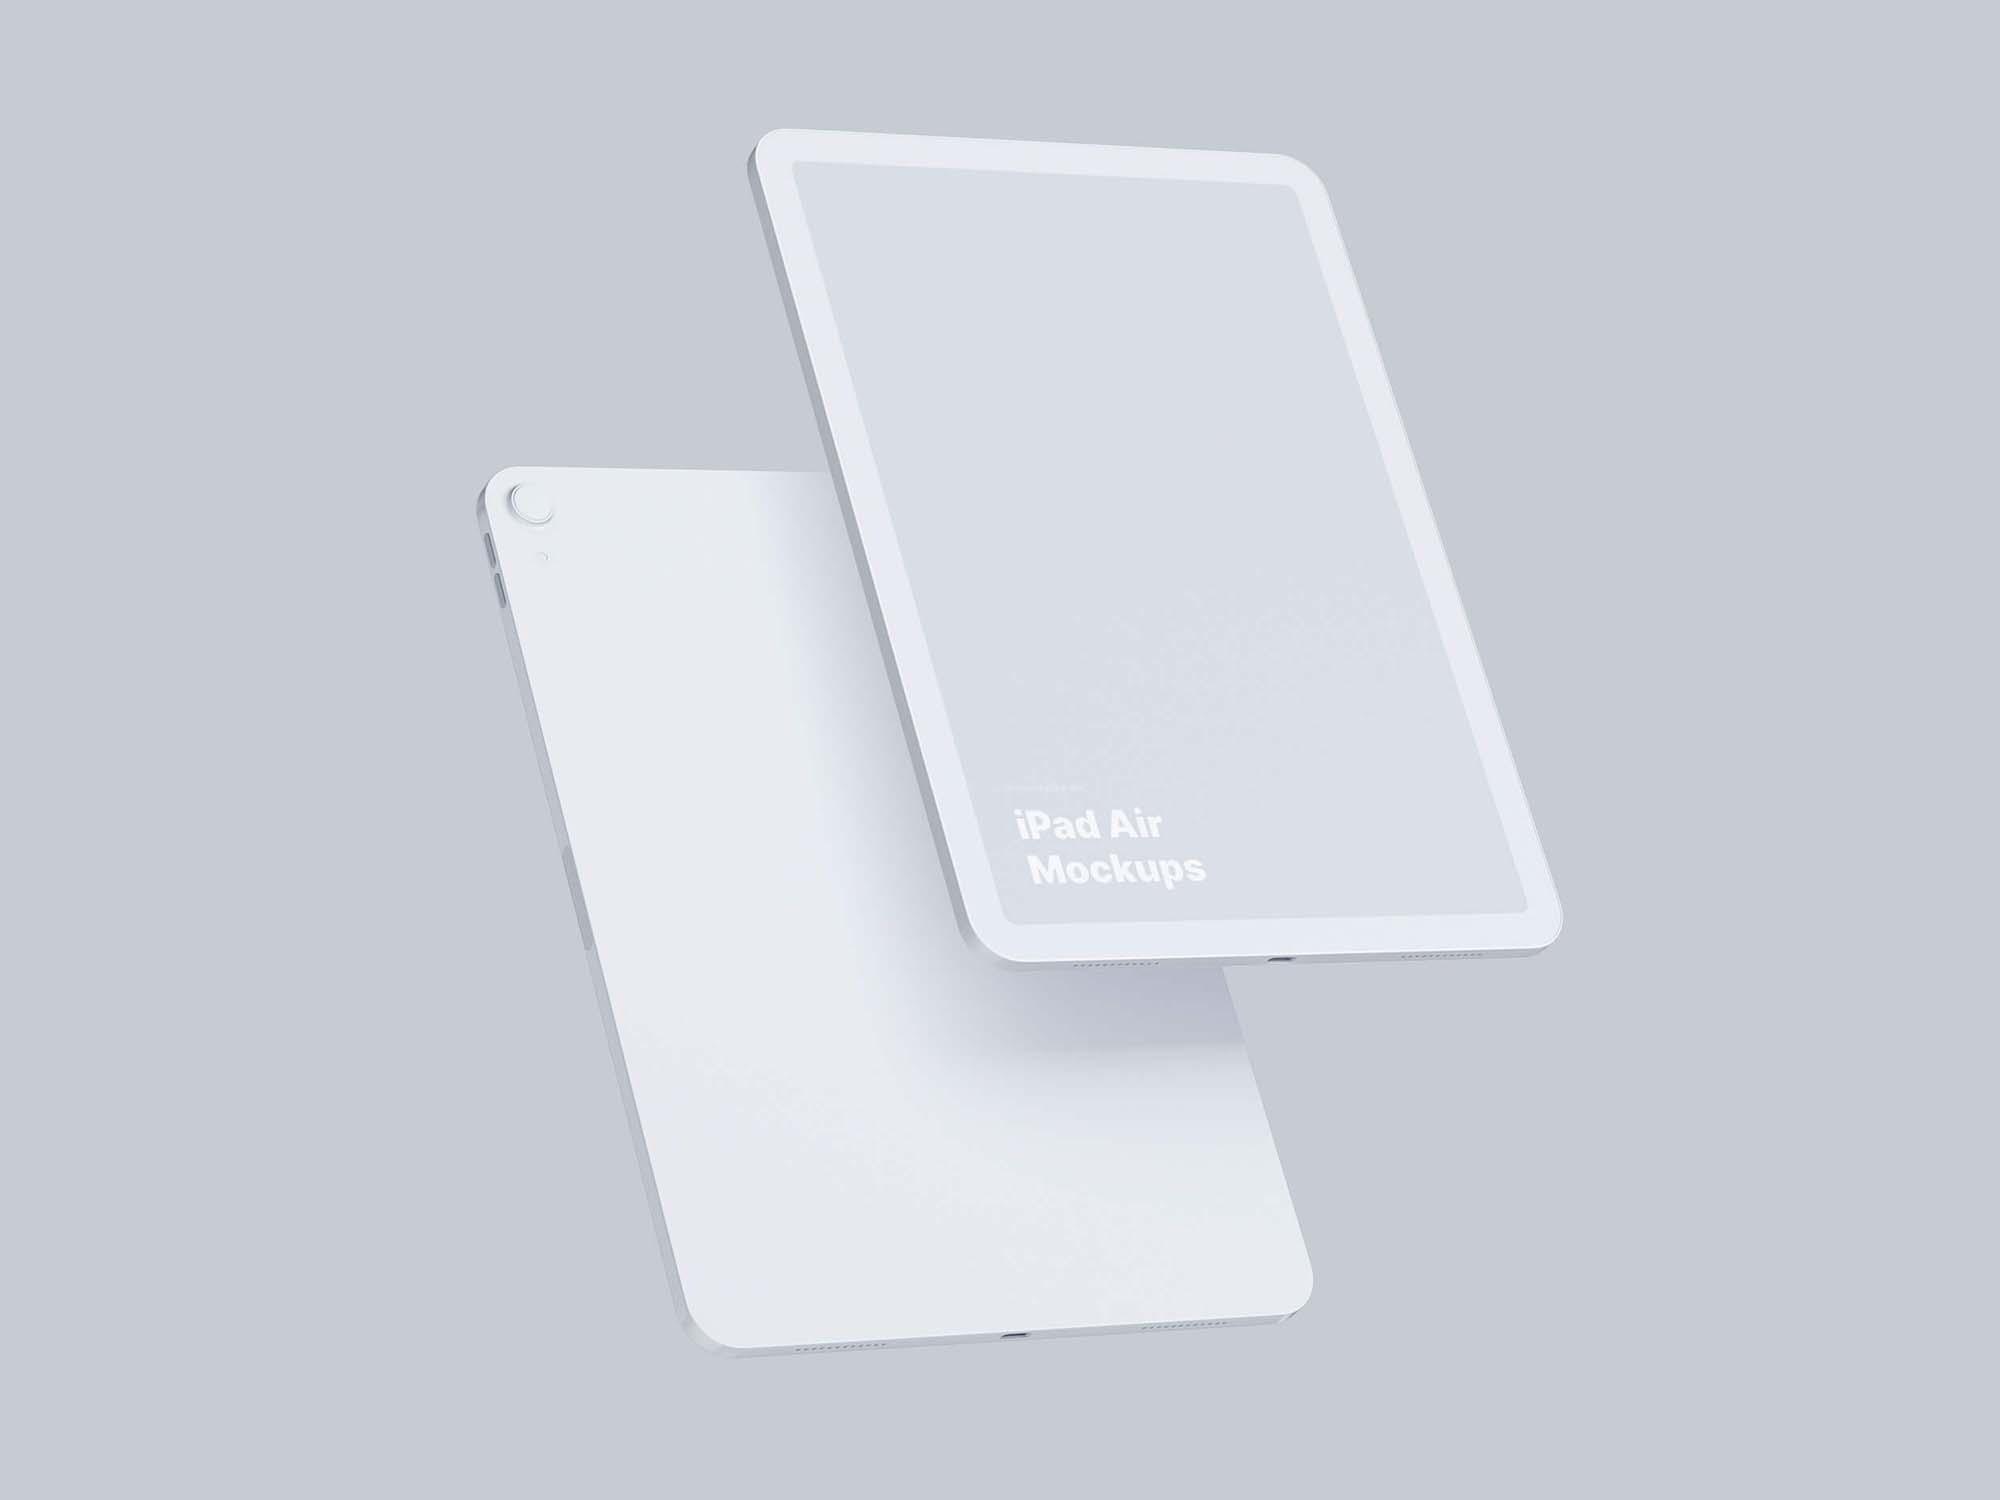 iPad Air Mockup 3